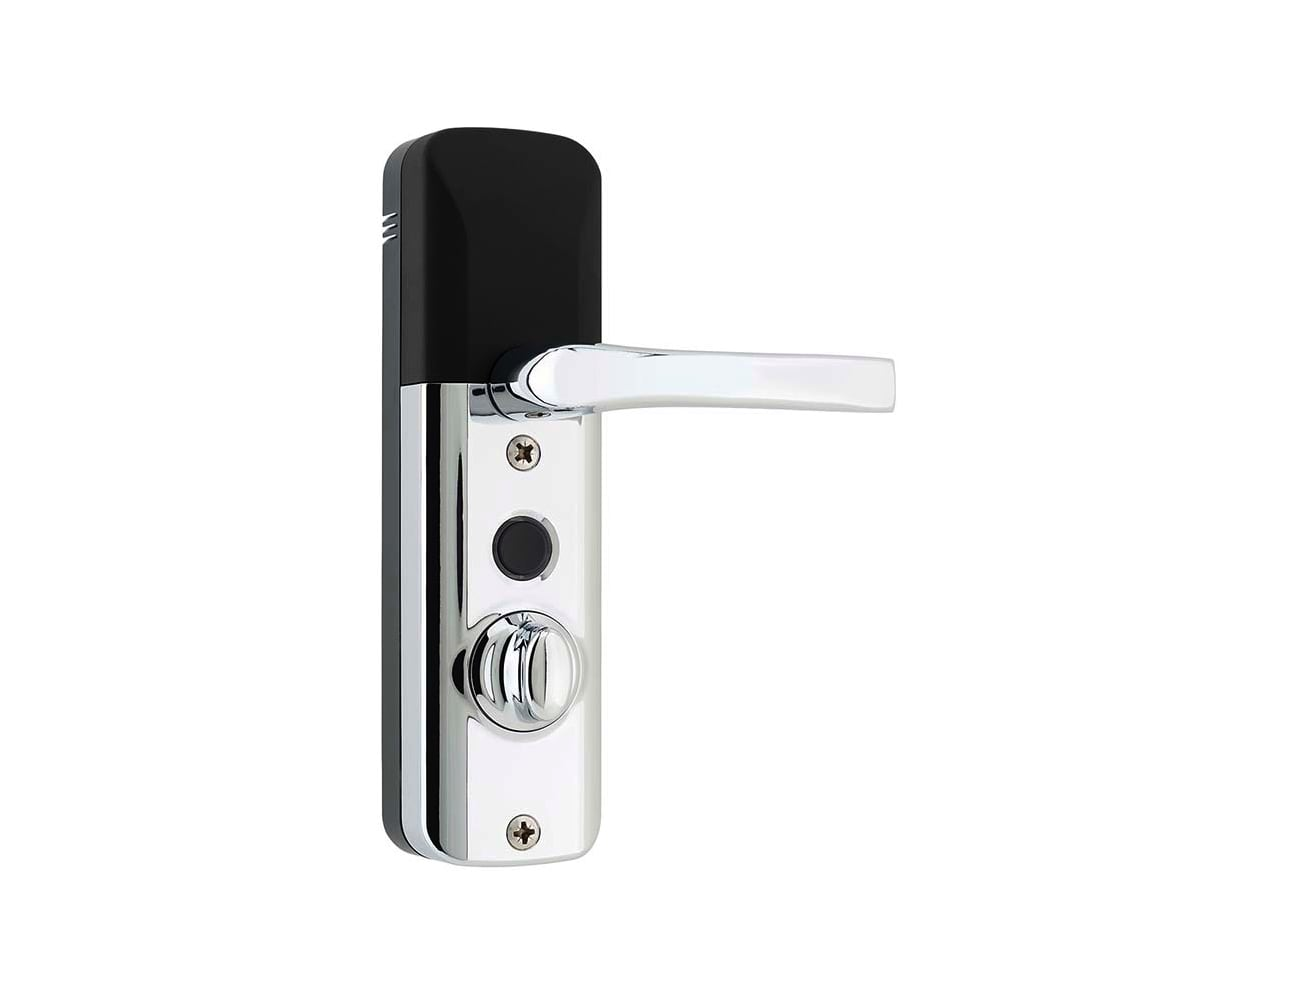 Avia Secure Multipoint Smart Lock